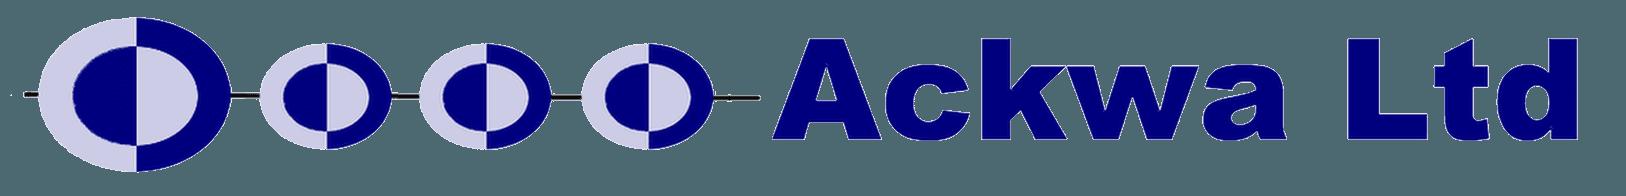 ackwa ltd logo